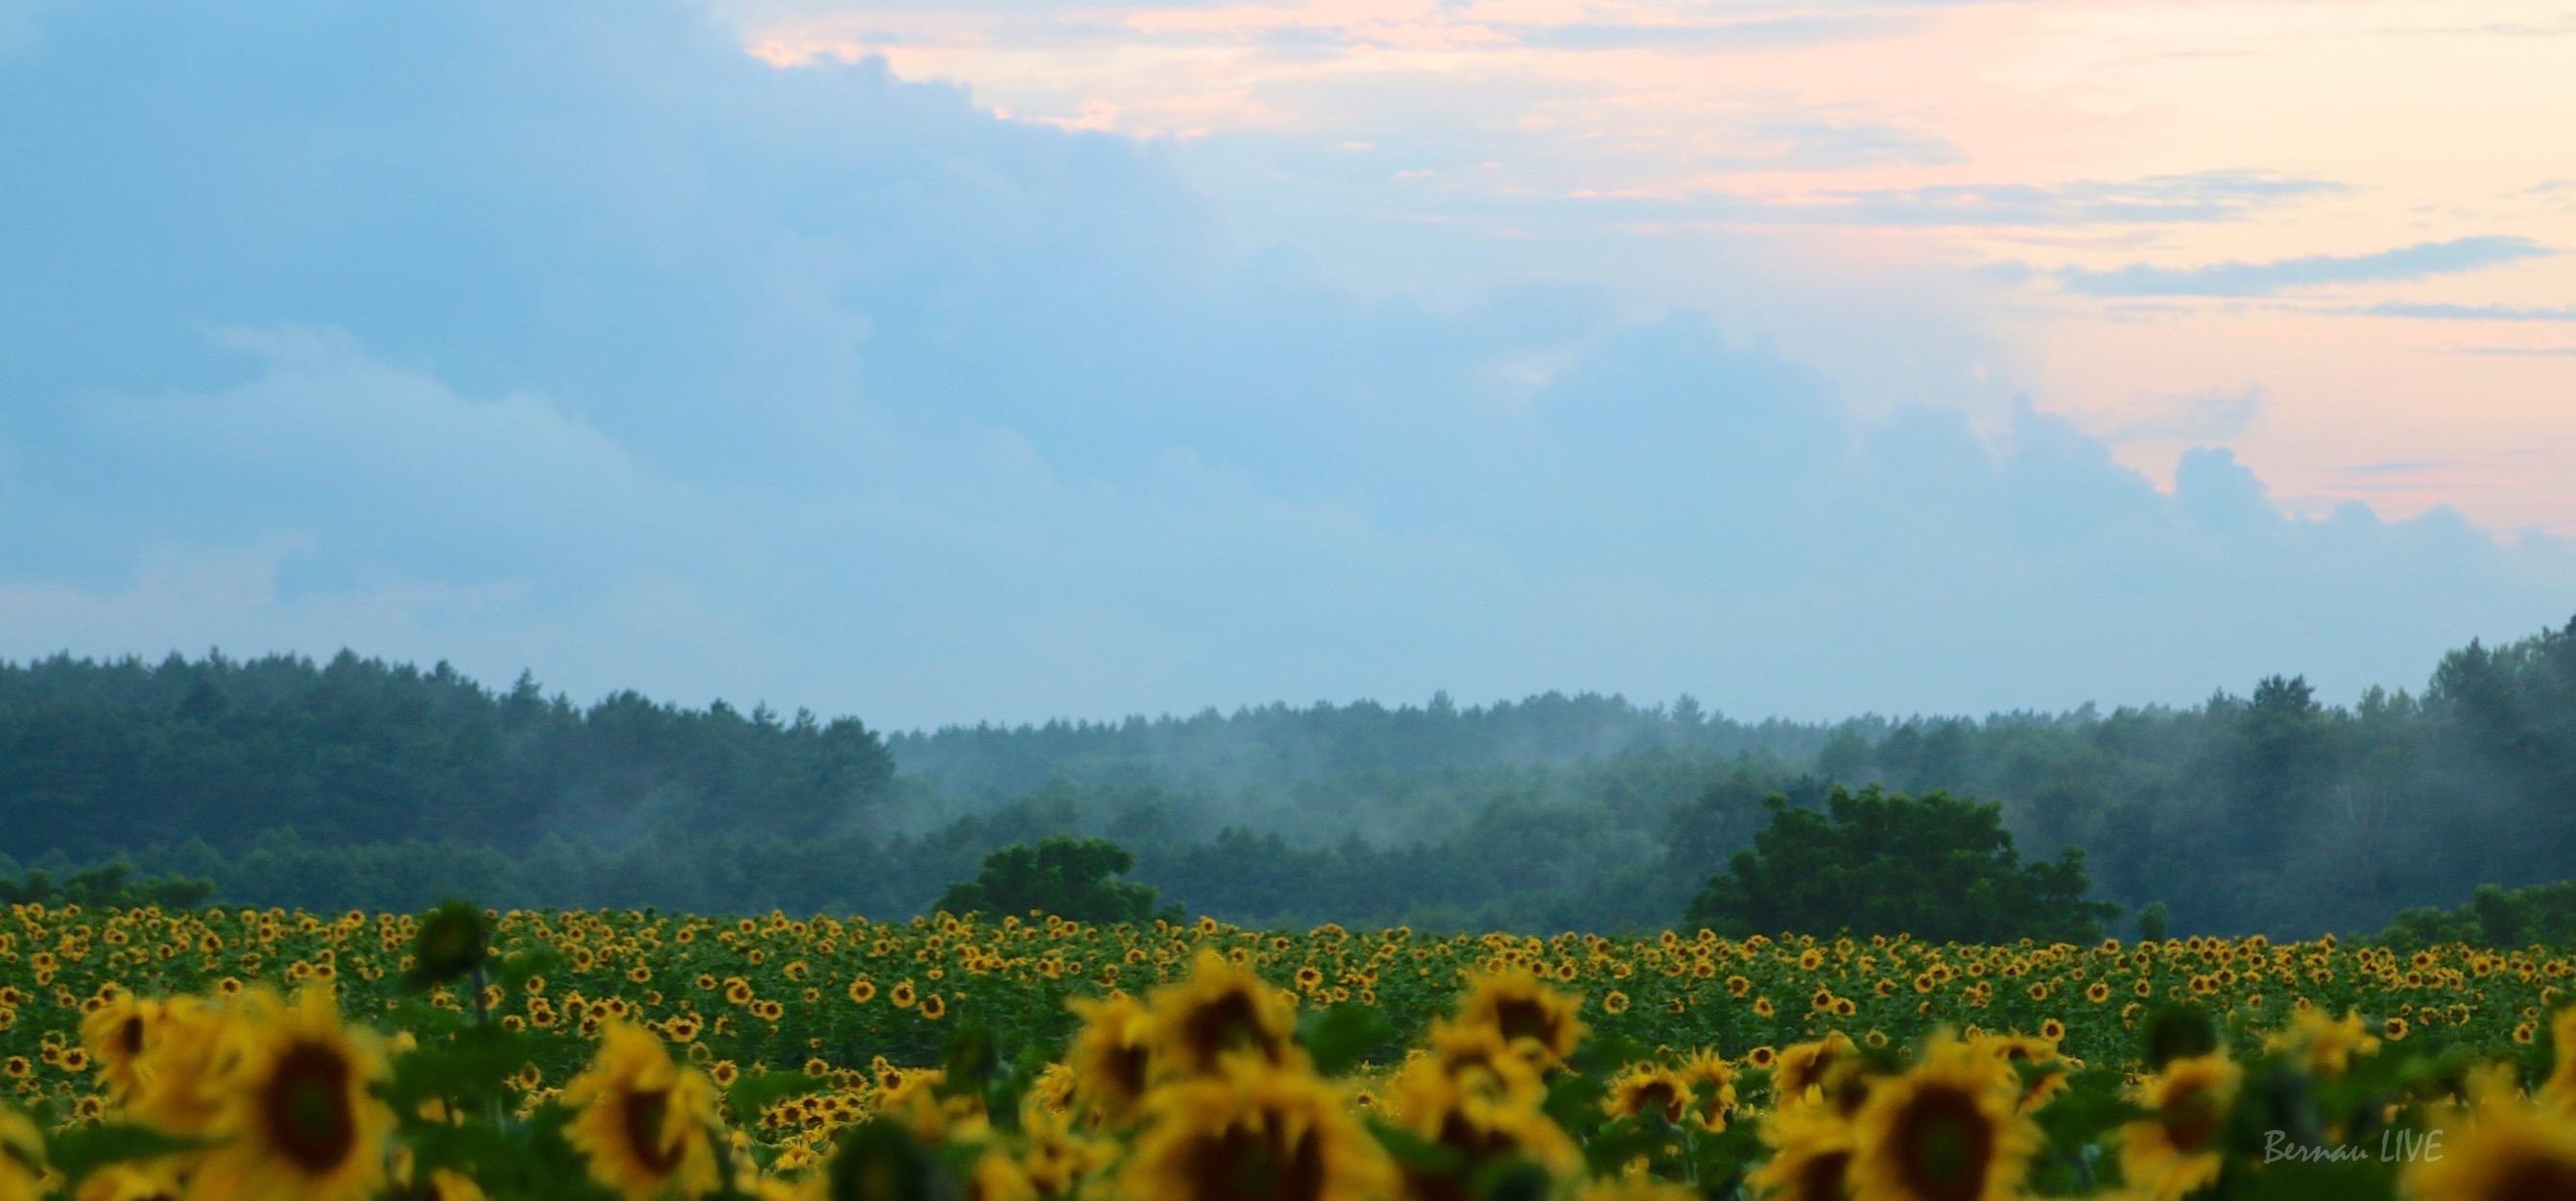 Barnim, Sonnenblumen, Feld, Natur, Morgen, Bernau, Biesenthal, Bernau LIVE